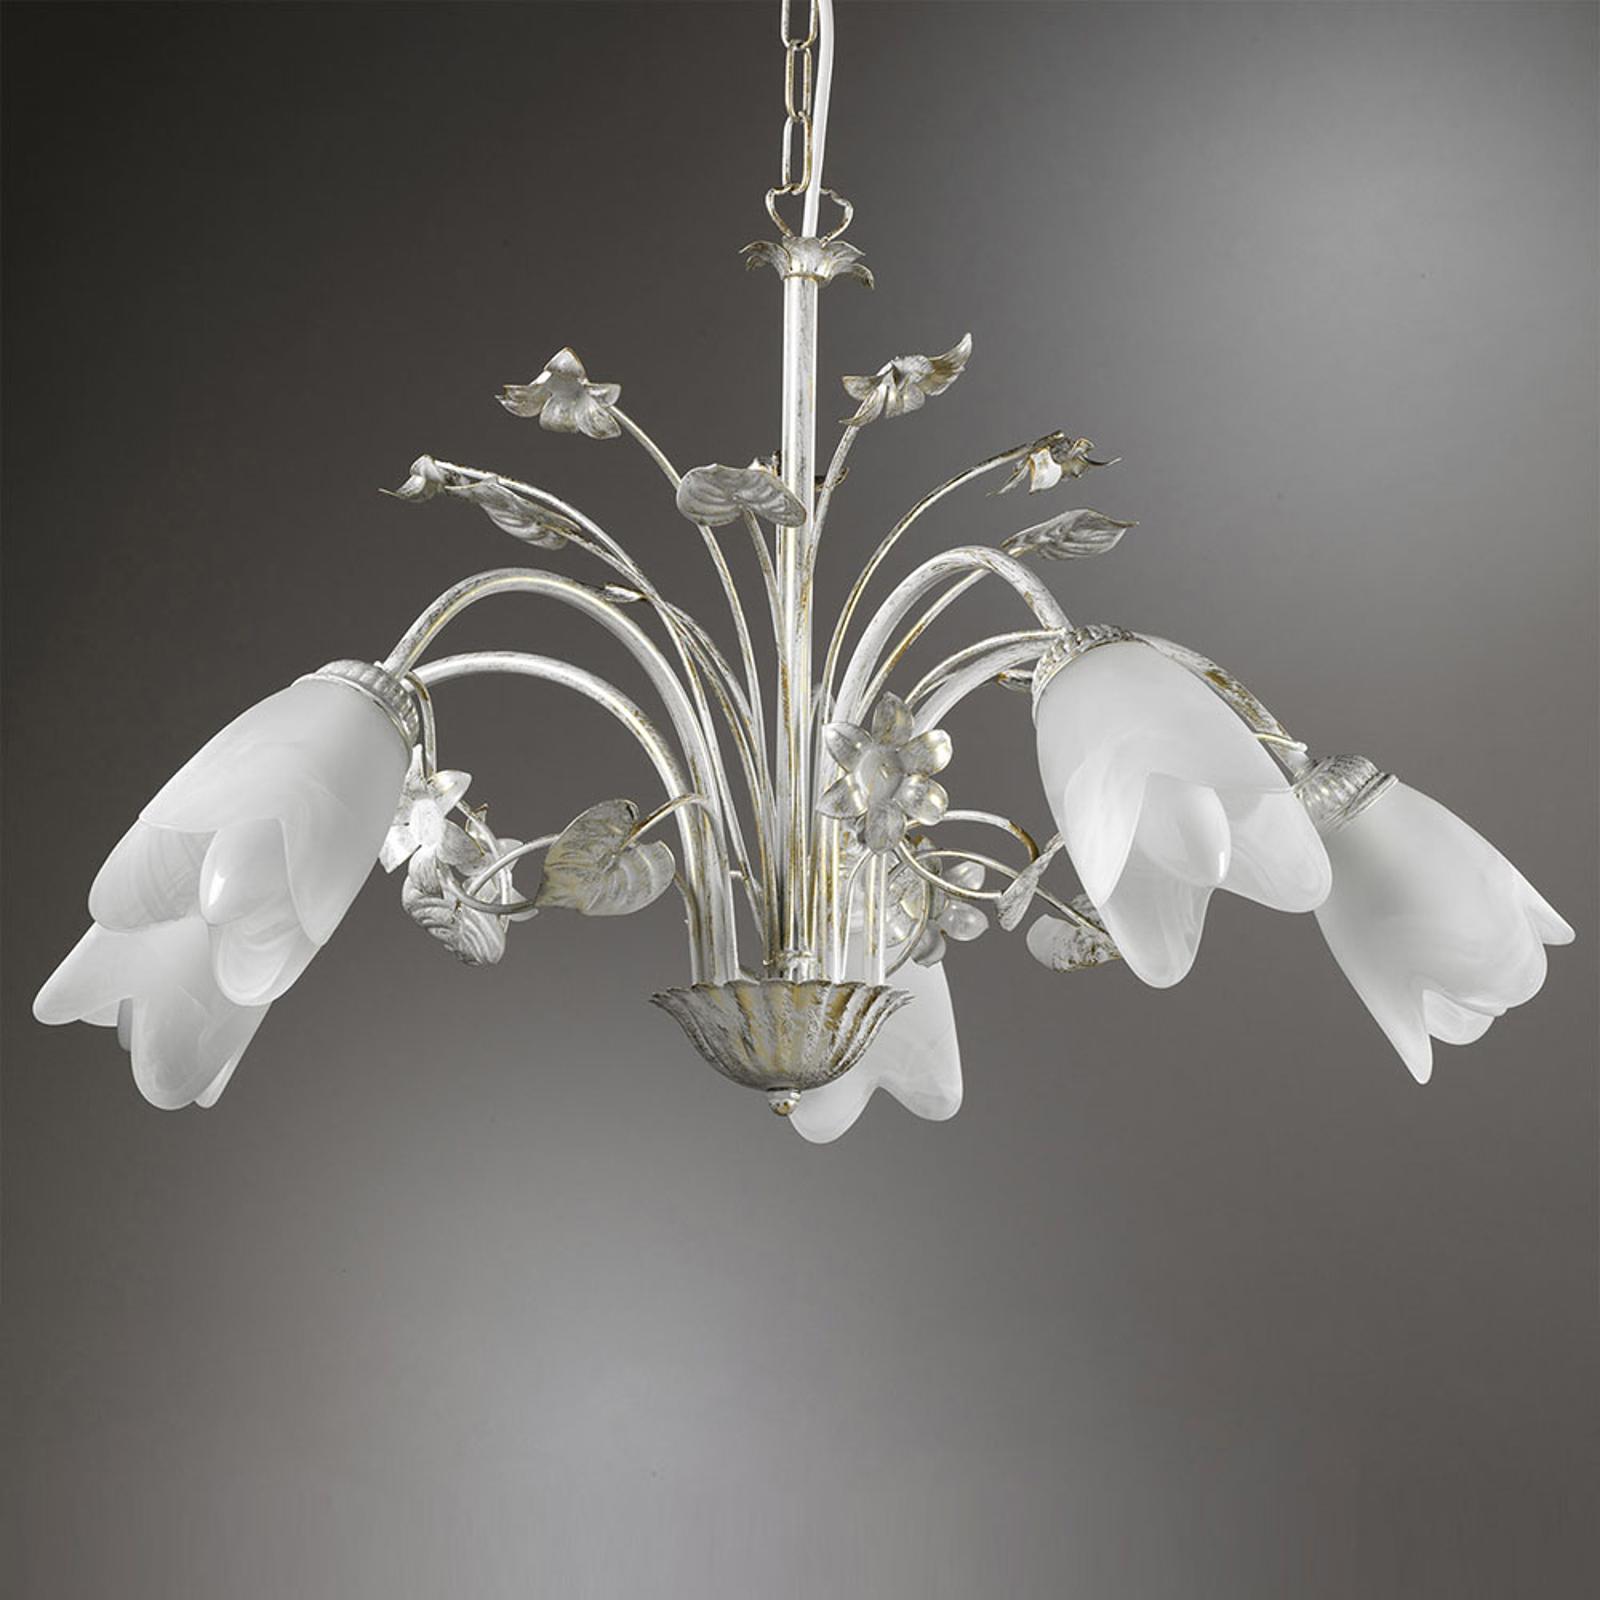 Petunia hængelampe, 5 lyskilder